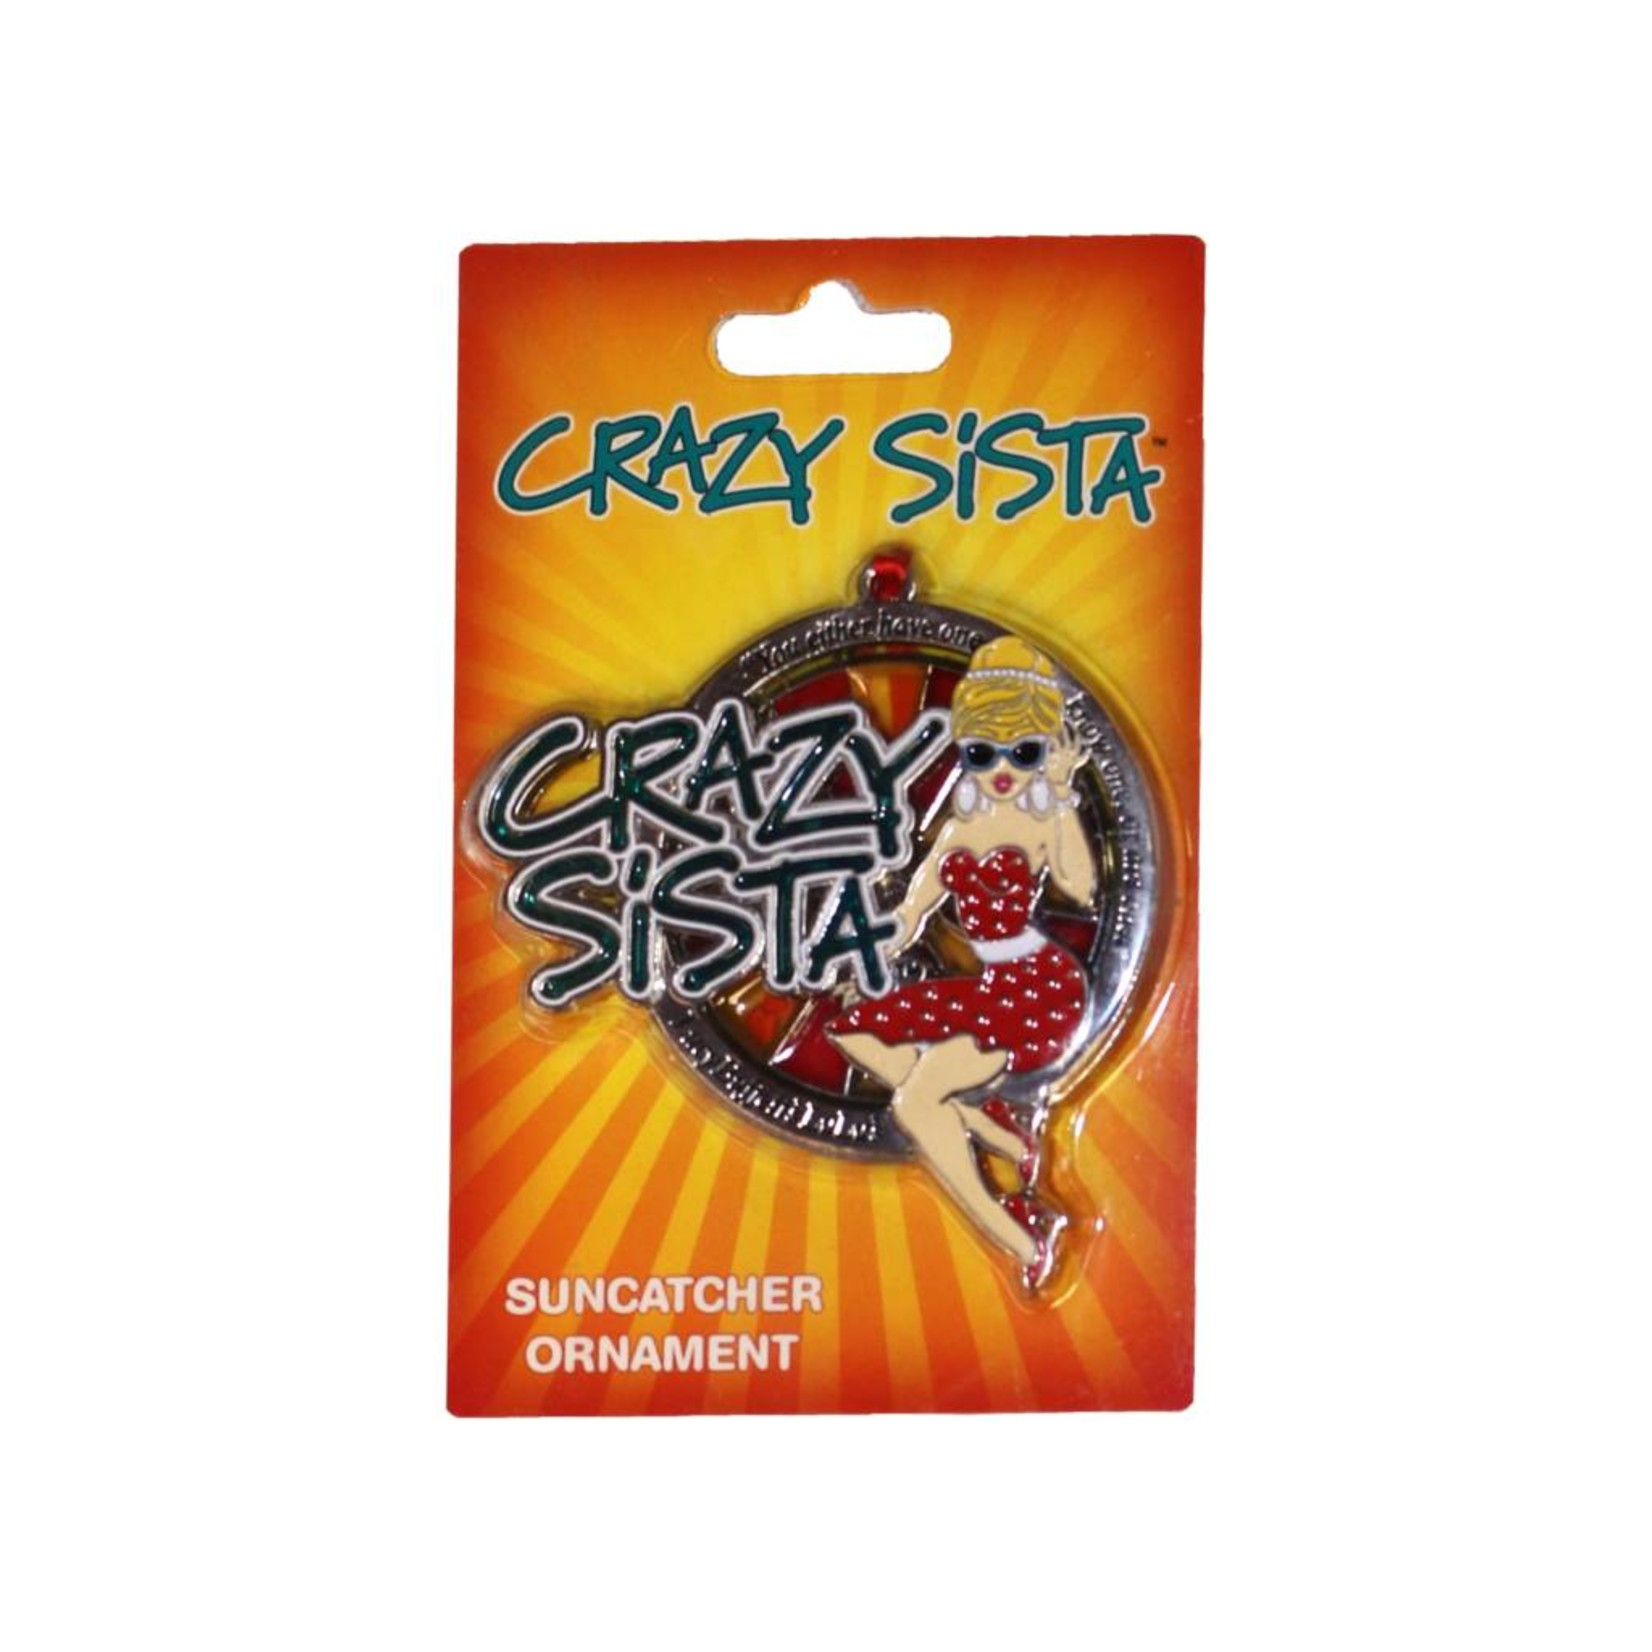 Crazy Sista Crazy Sista Sun Catcher Ornament